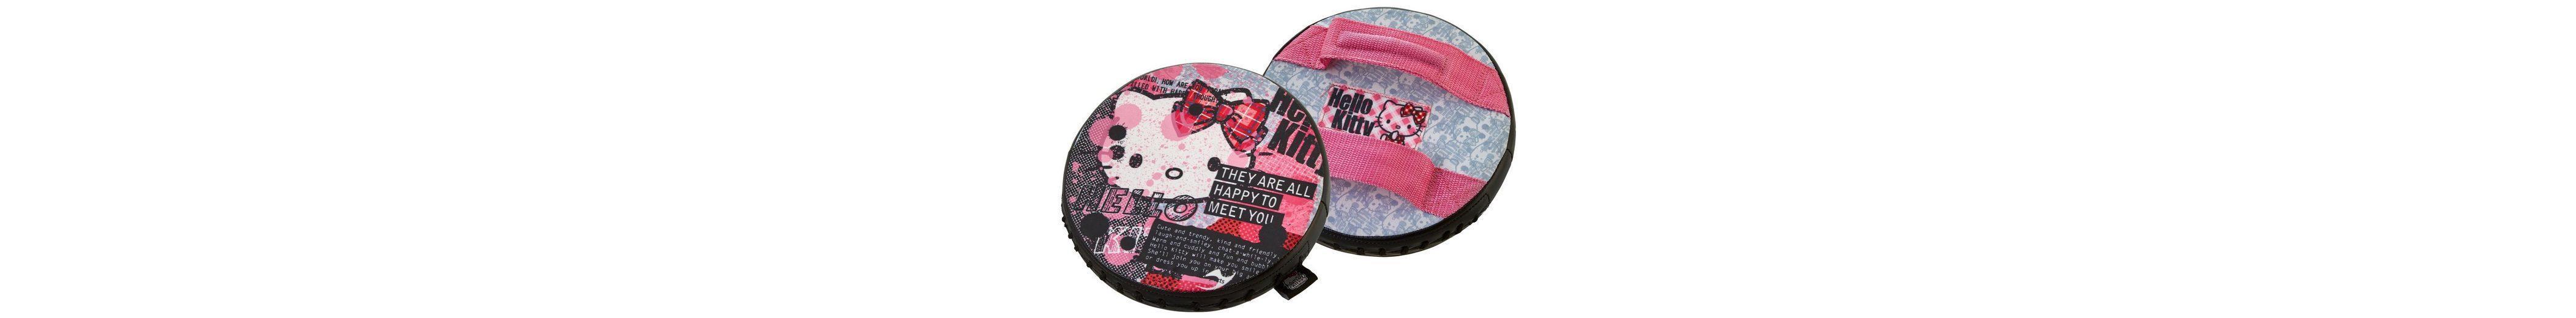 Ju-Sports Kinder Rundpratze, »Hello Kitty Punk Chic«